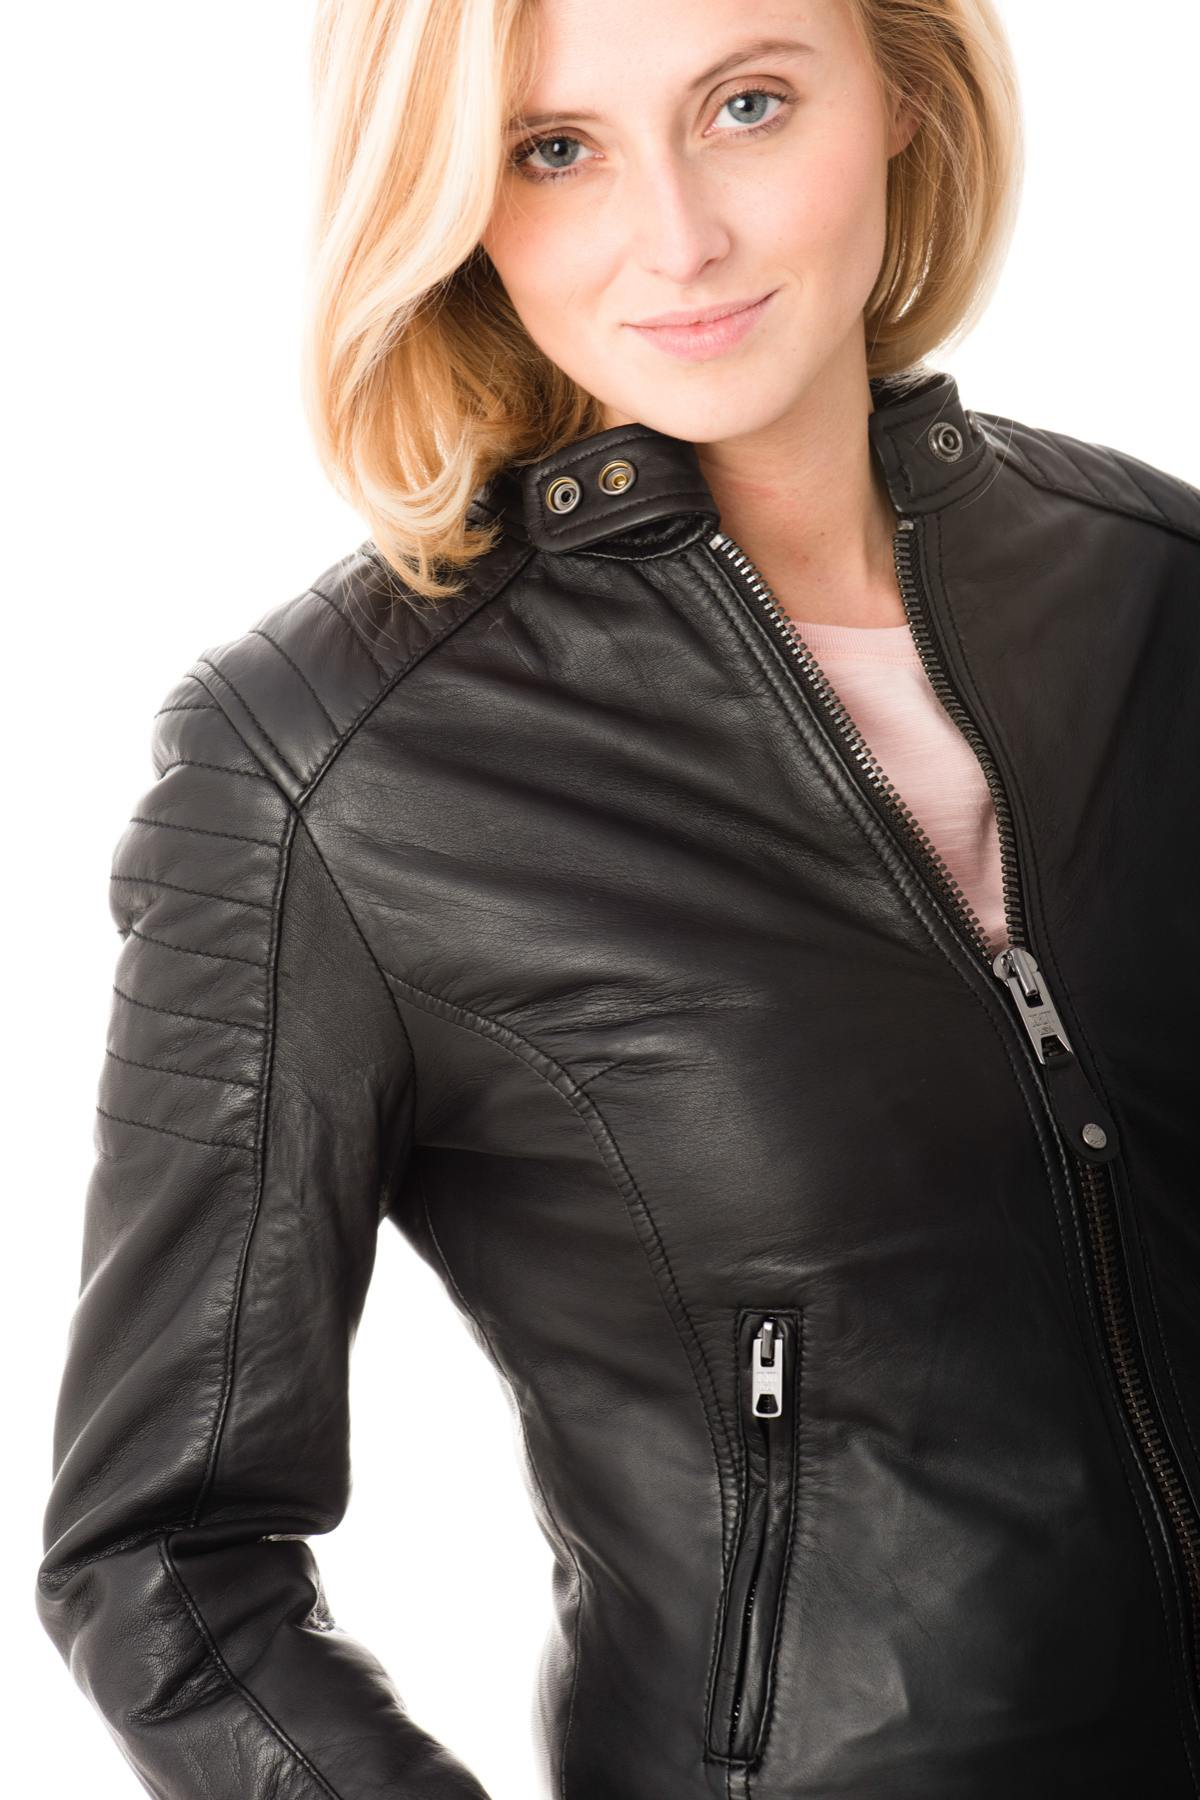 Chaqueta 84whxqx de Leather Black Schott Lcwharvey mujer DW92IYEHe